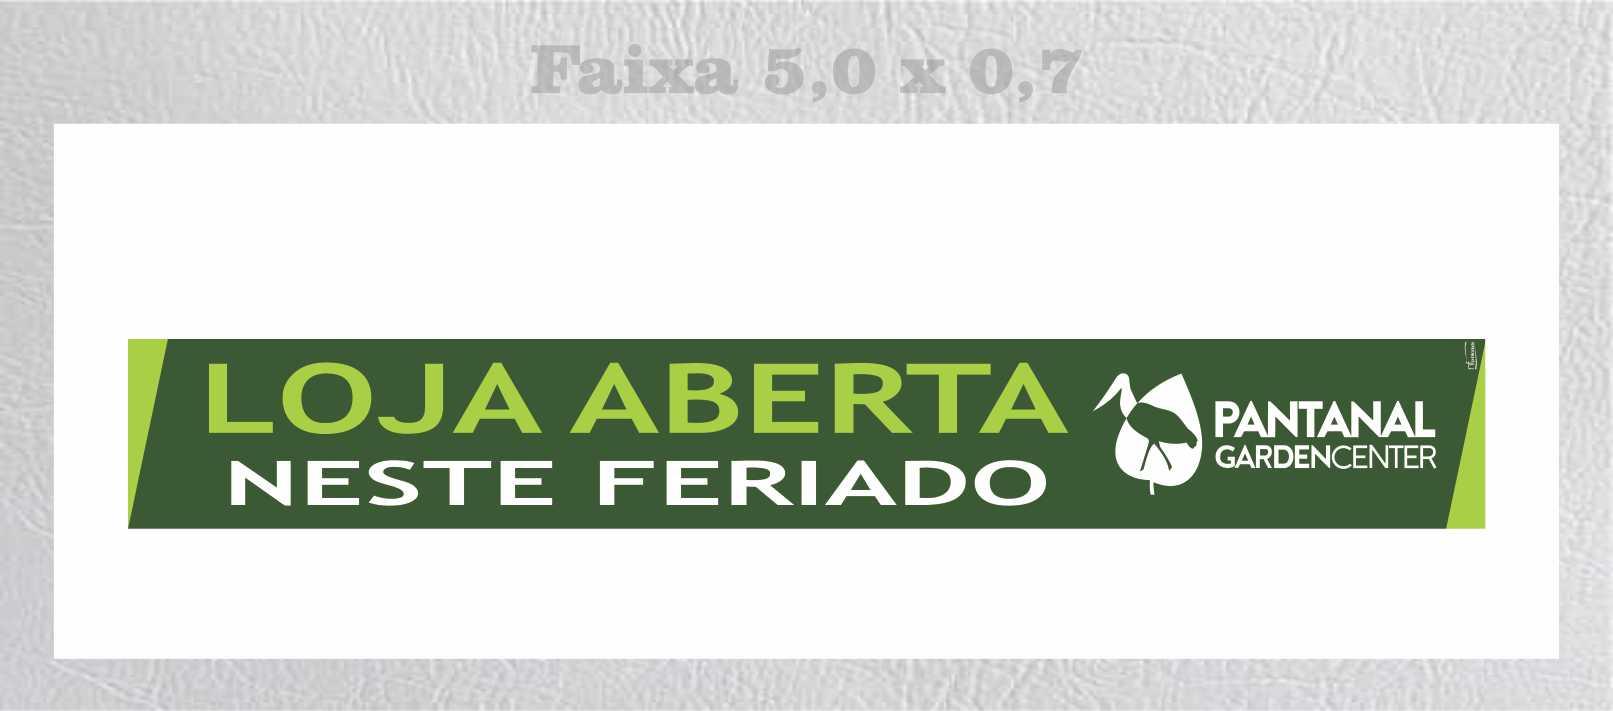 PANTNALA FAIXA FERIADO